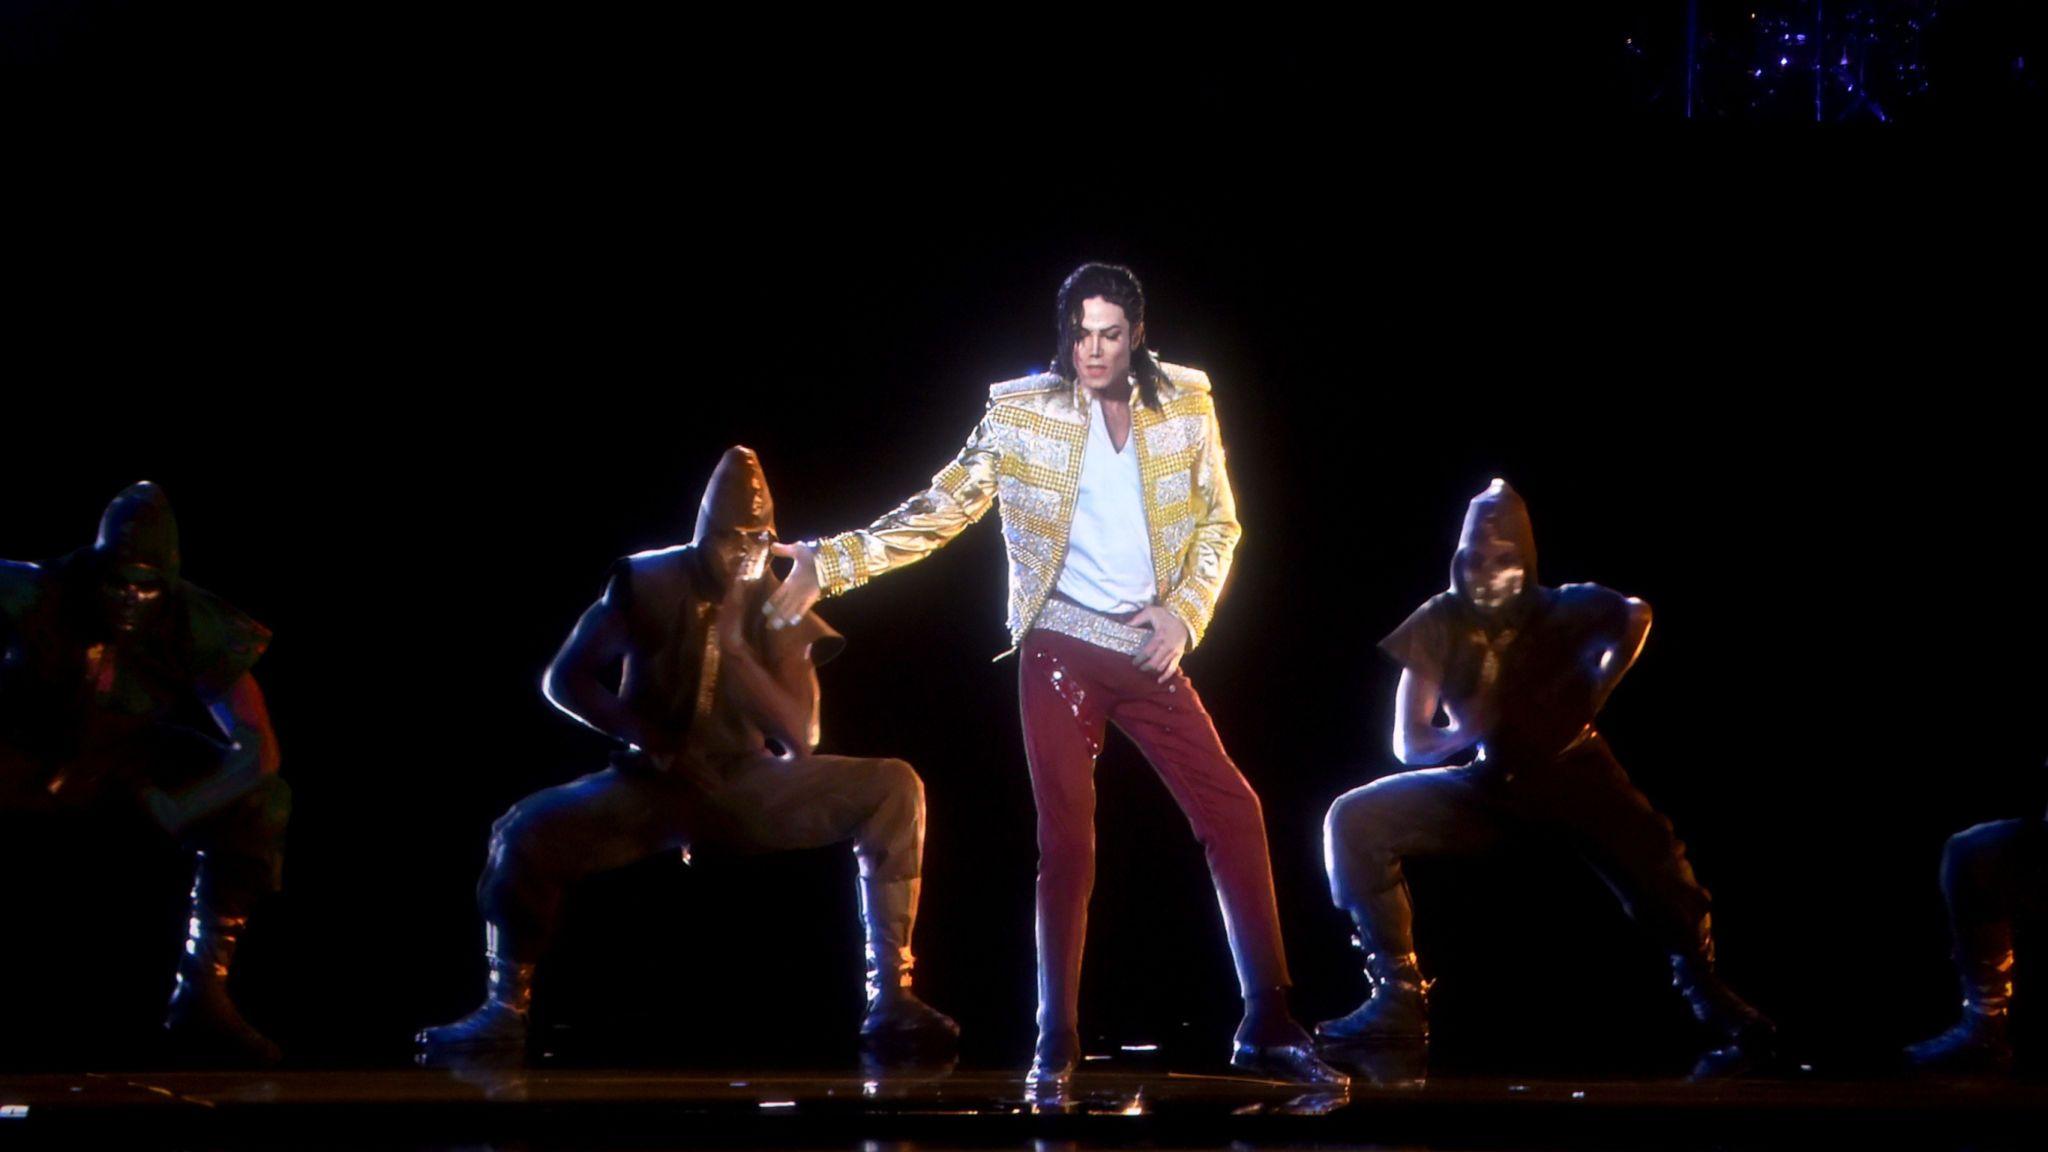 Michael Jackson's hologram performed the moonwalk at the 2014 Billboard Music Awards